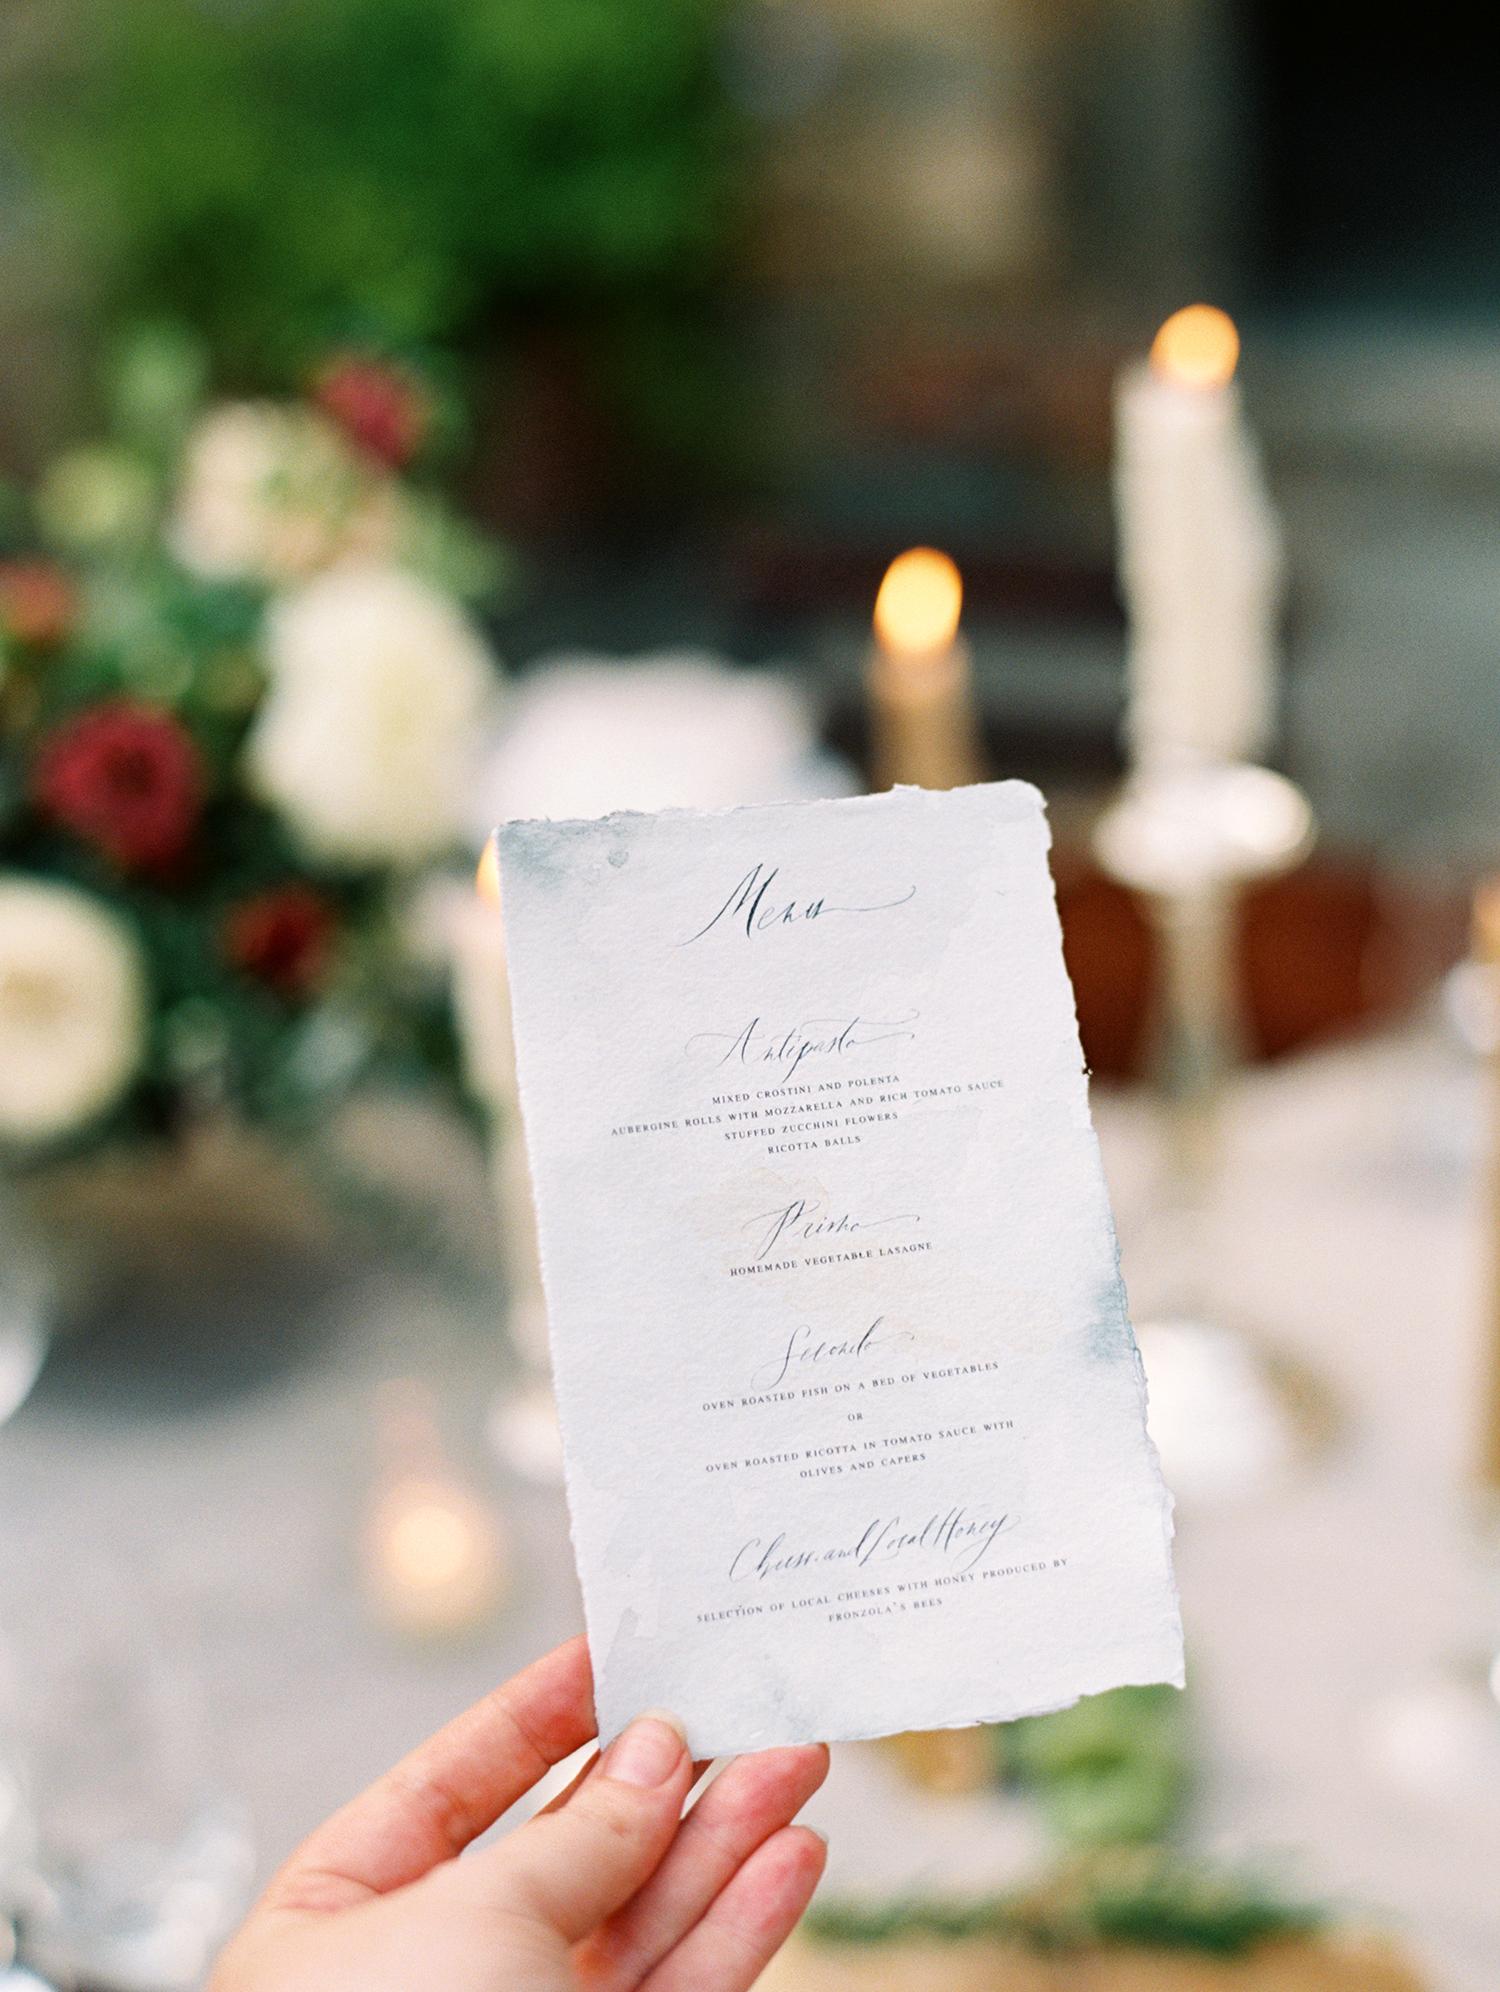 kelly pete wedding hand holding menu